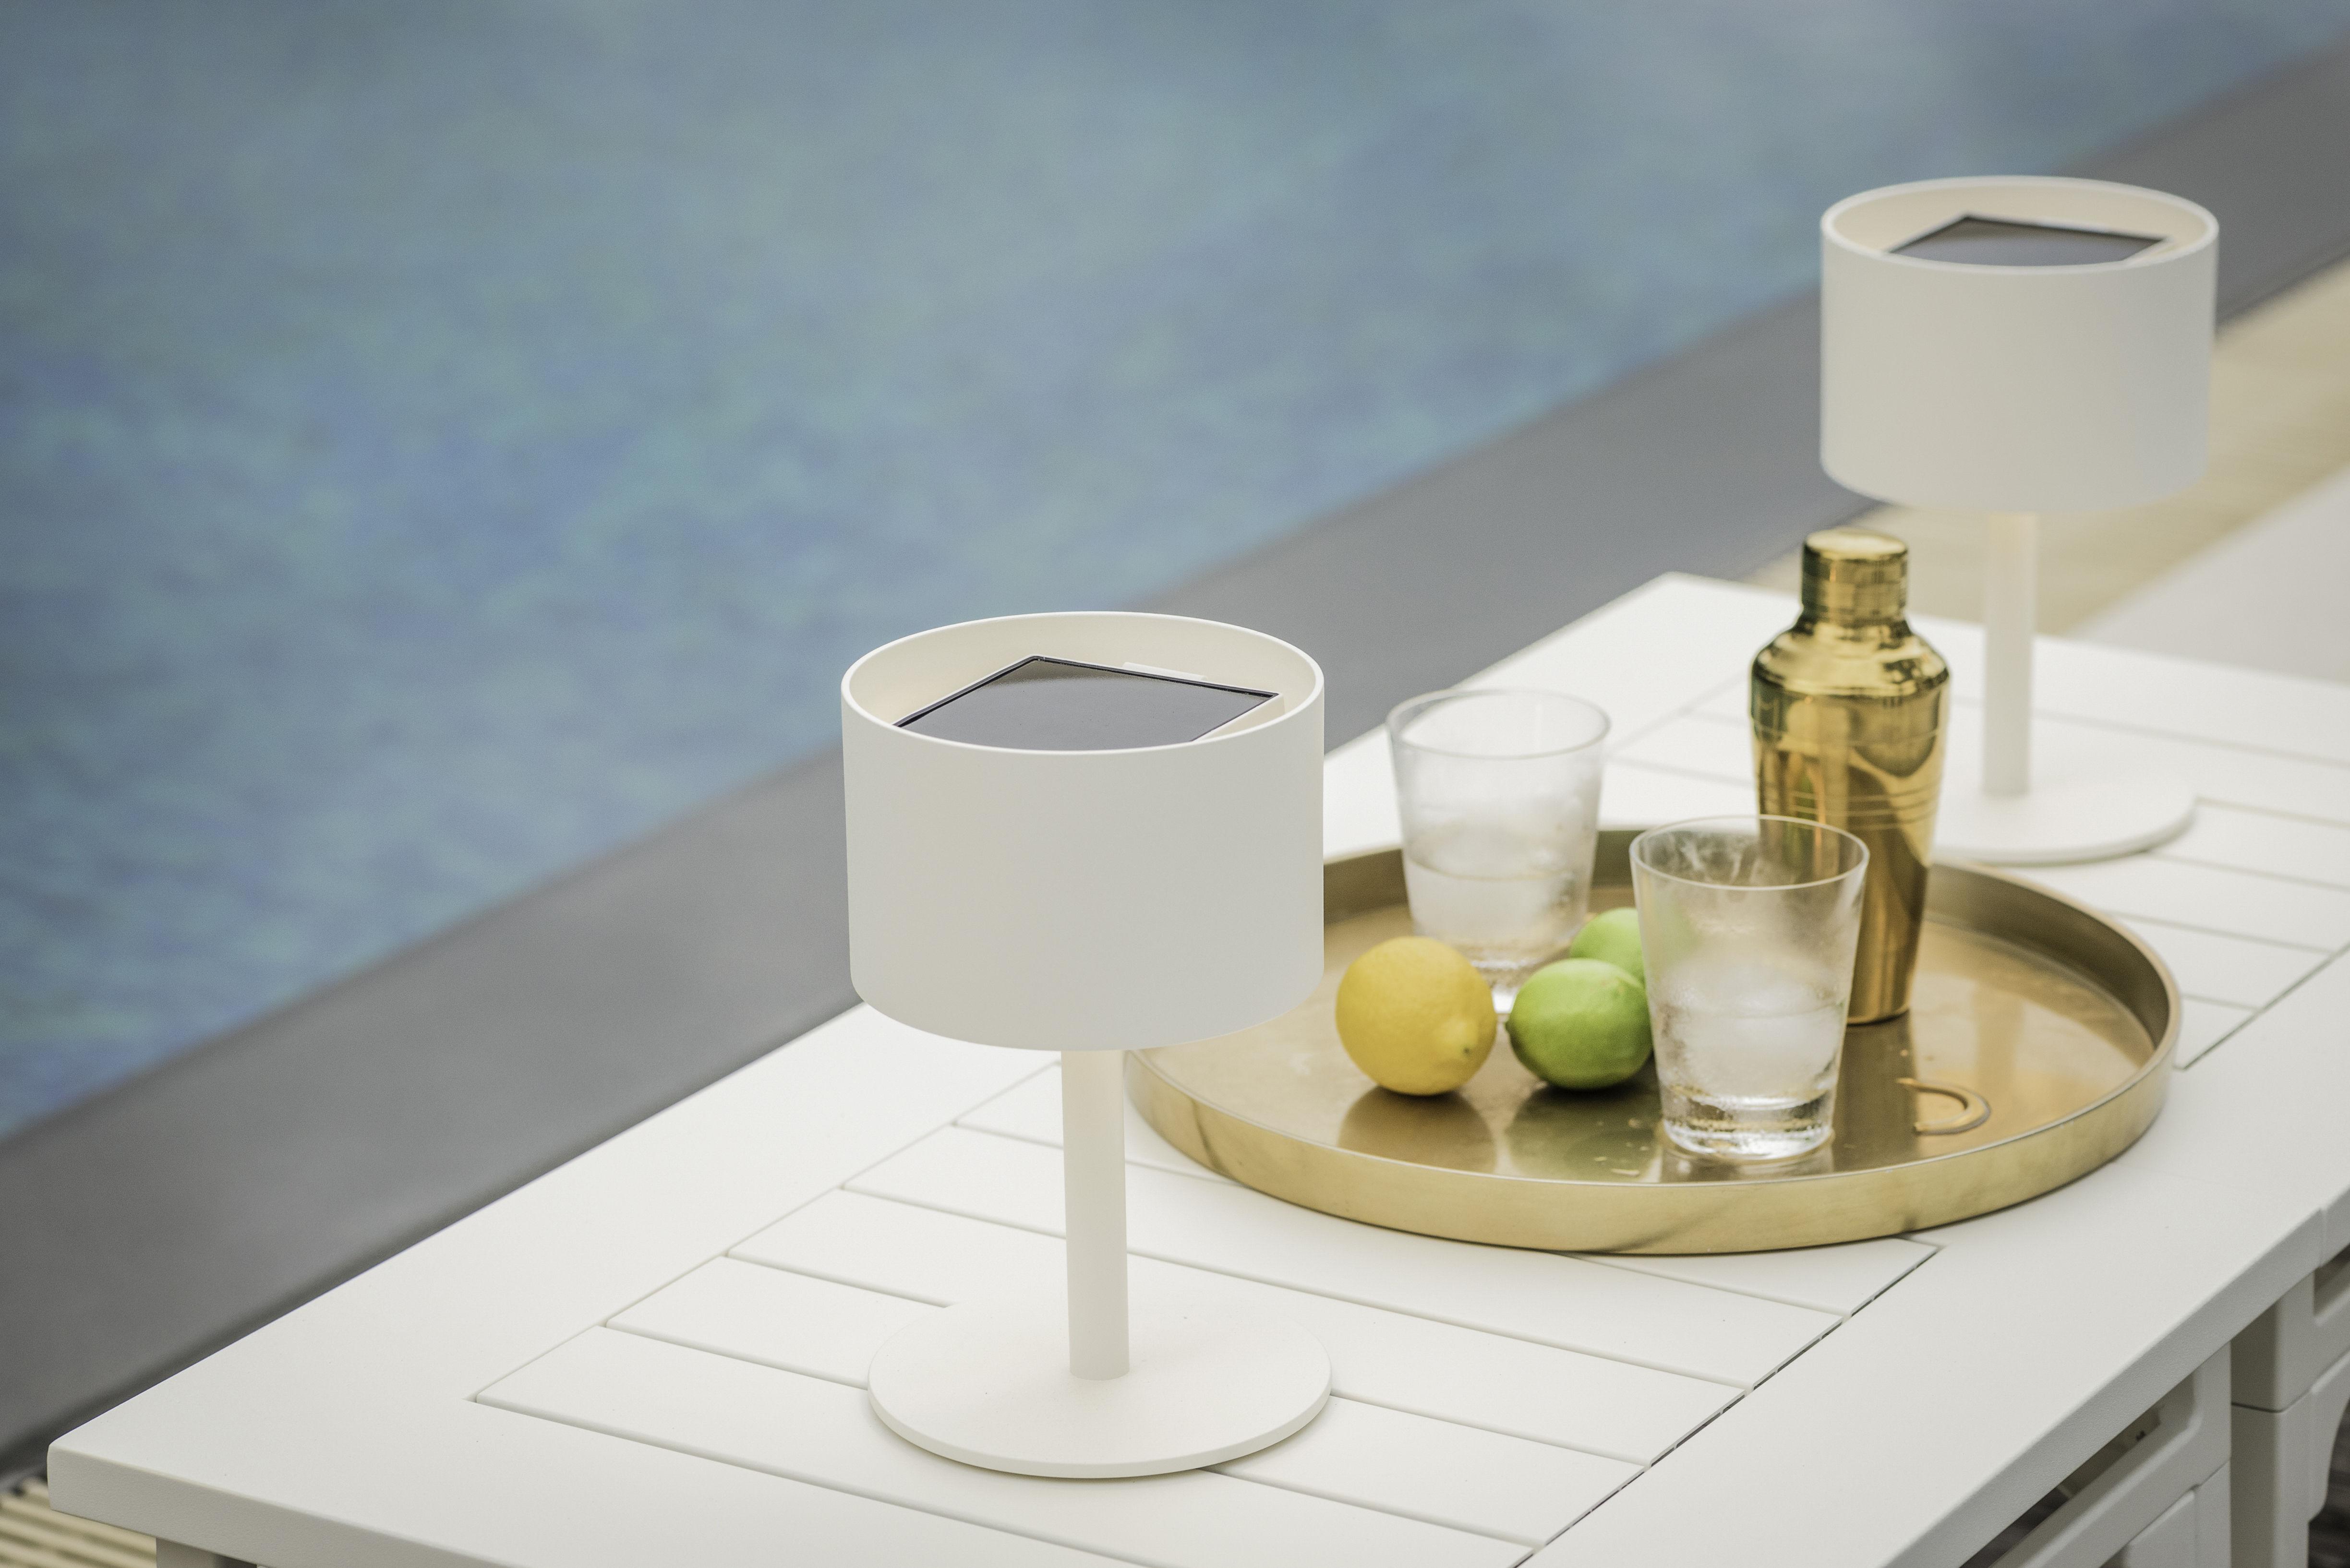 lampe solaire la lampe pose 01 led sans fil charbon maiori. Black Bedroom Furniture Sets. Home Design Ideas